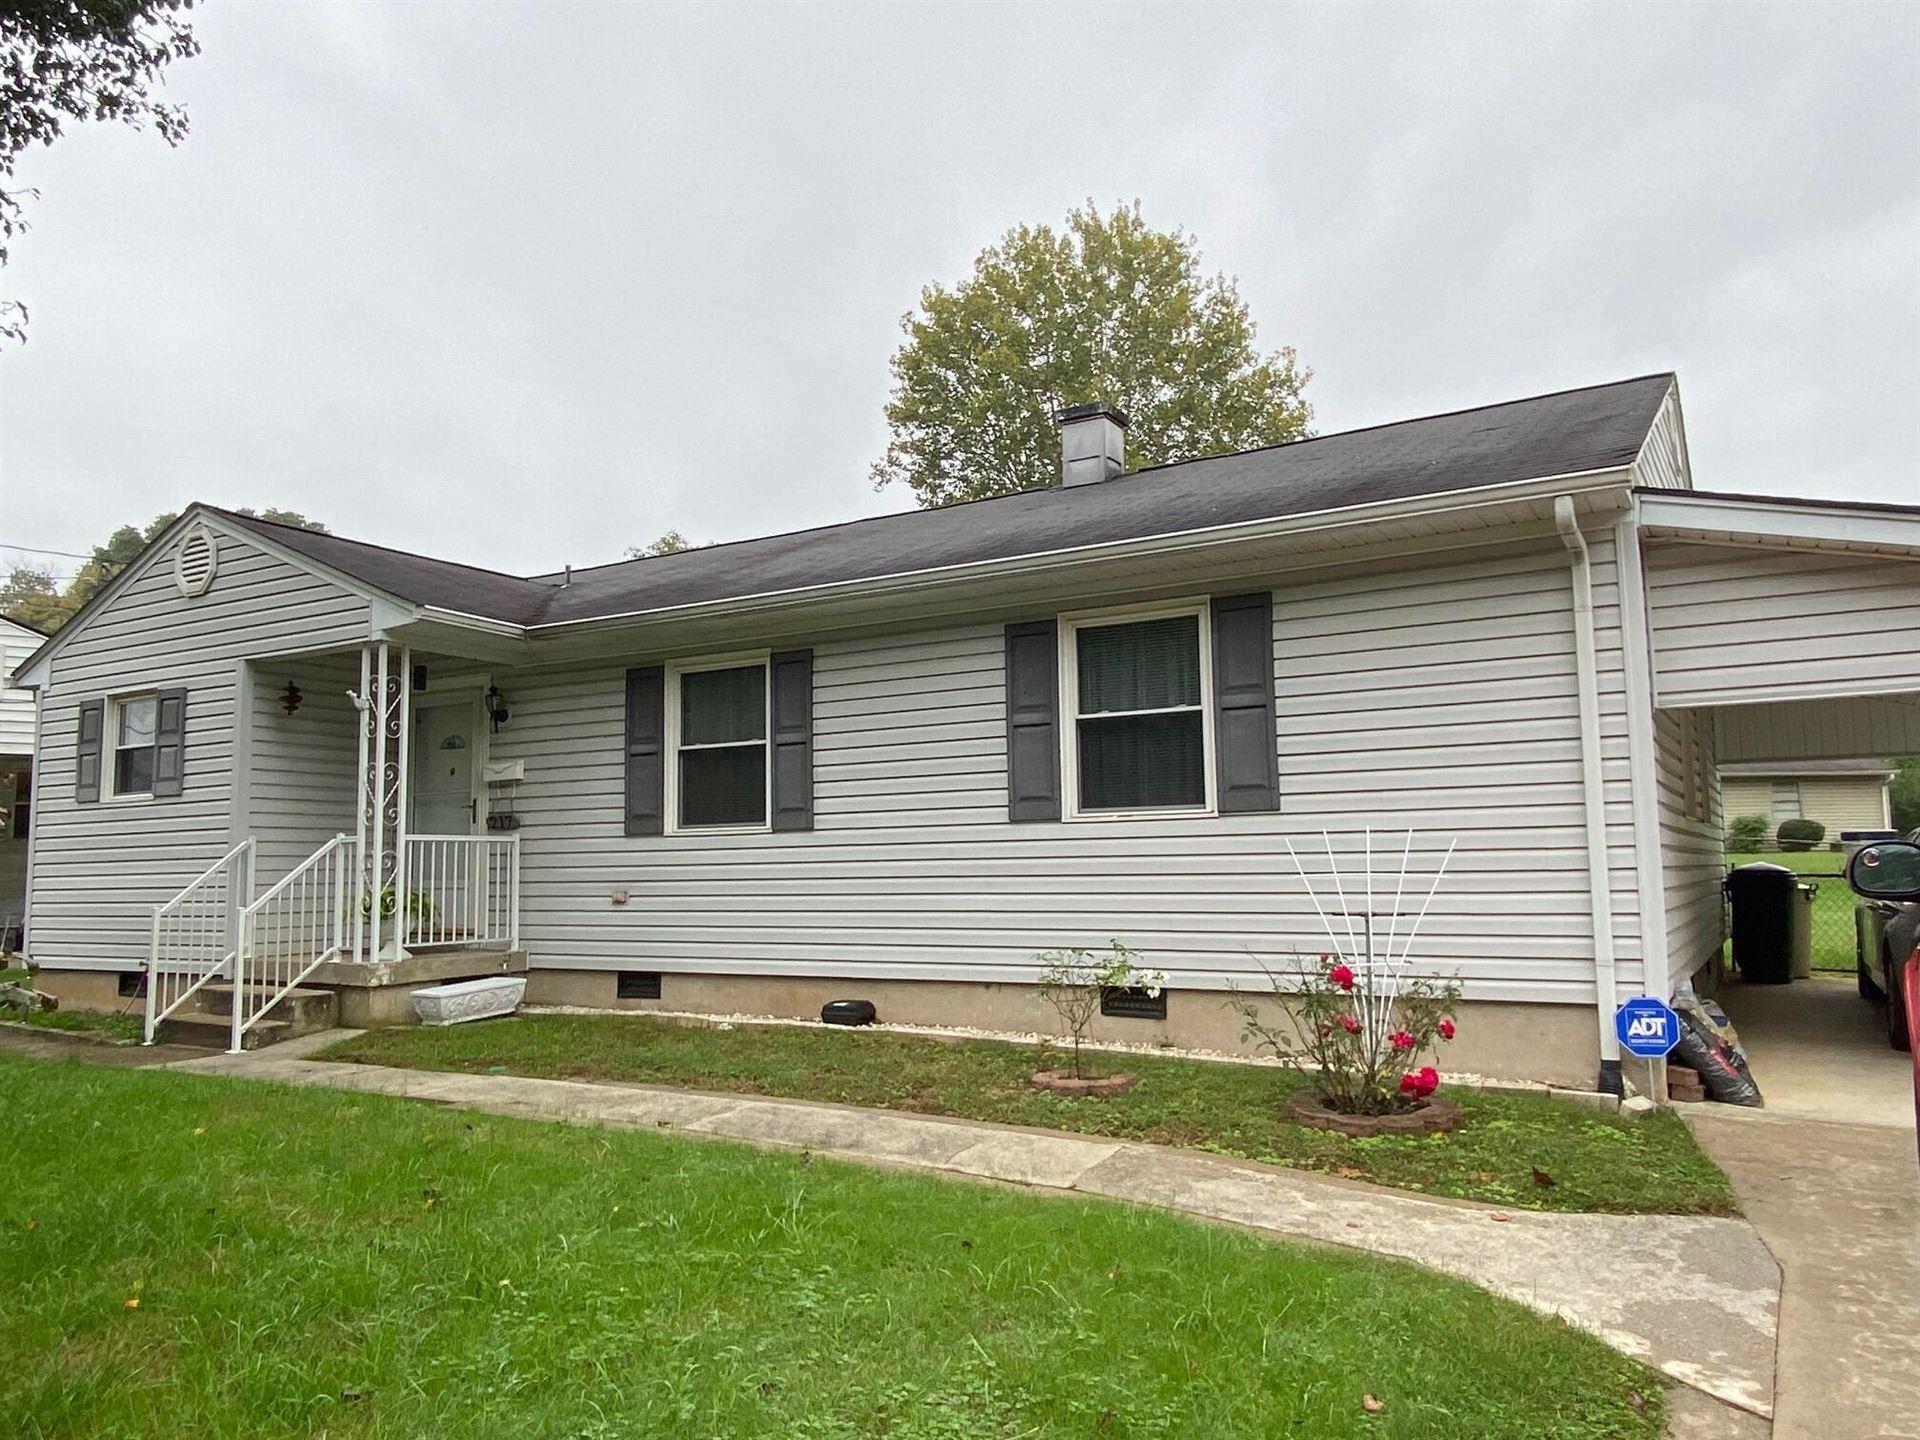 Photo of 217 East Drive, Oak Ridge, TN 37830 (MLS # 1169870)